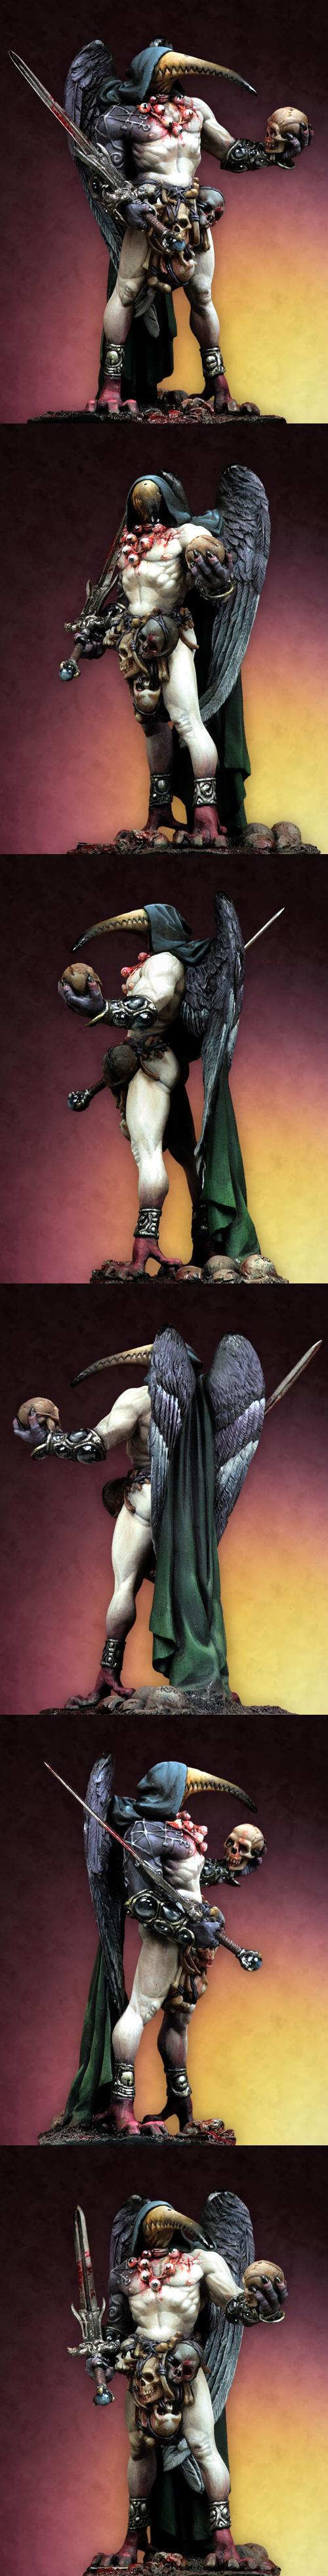 Kuvar Reaper - GEHENNA by Pegaso Models